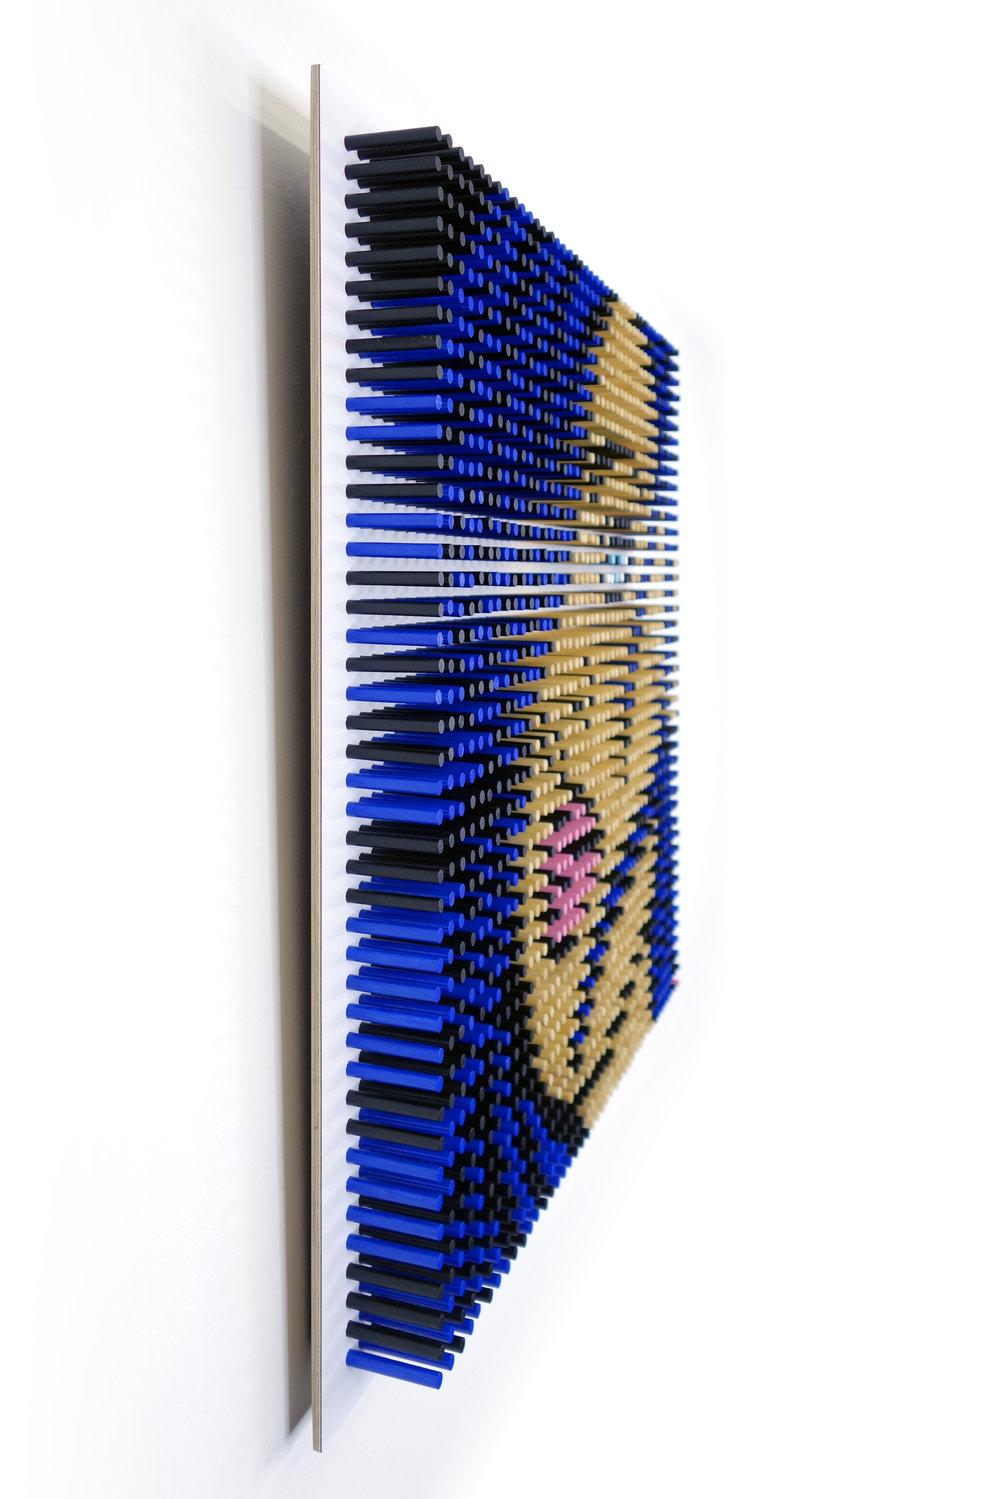 BILFIELD_GONEWITHTHEWIND-BLUE_3.jpg